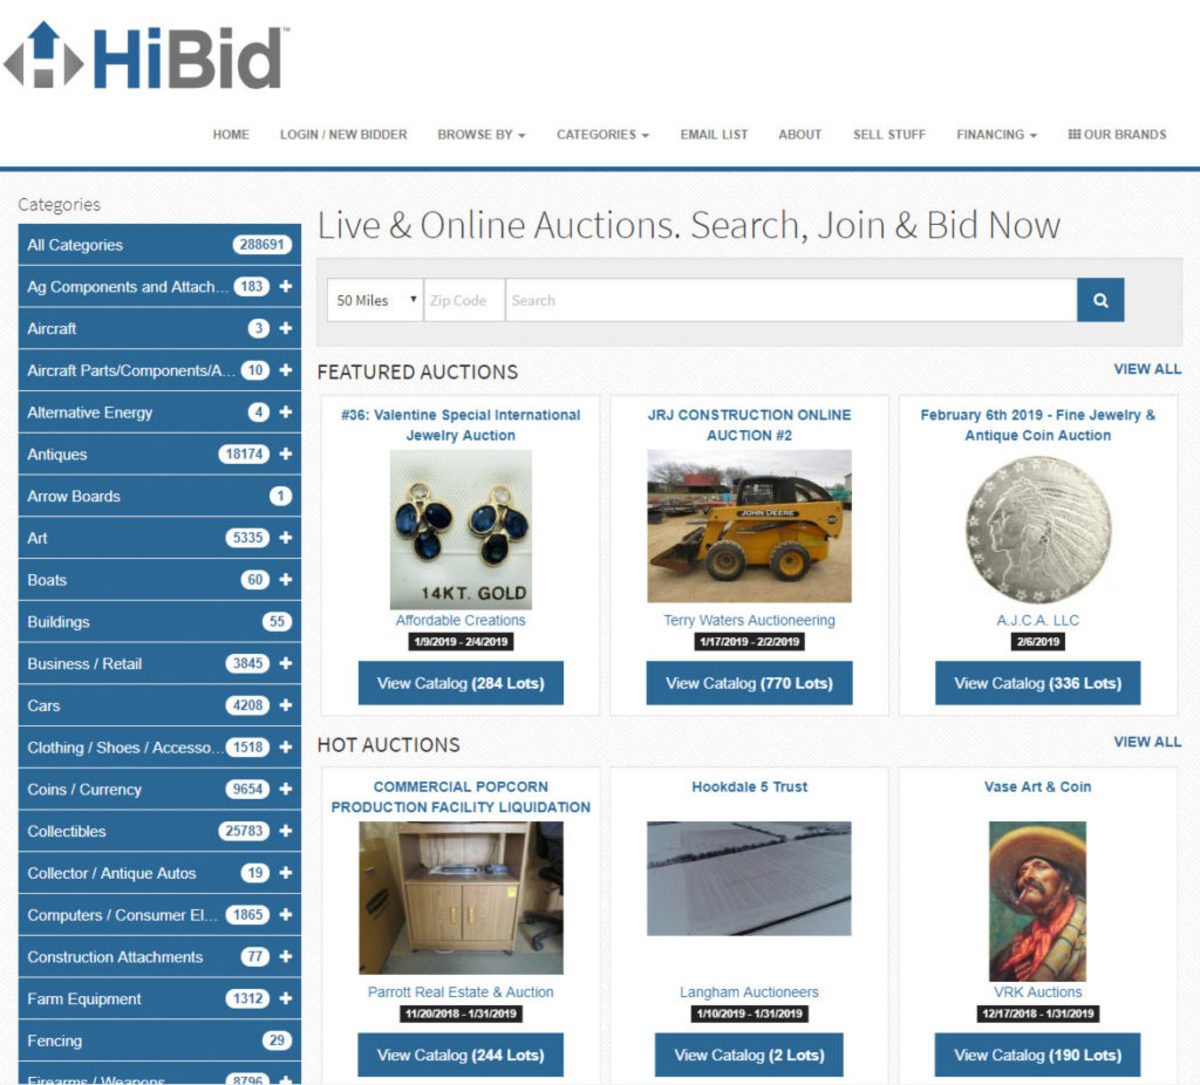 HiBid.com home page